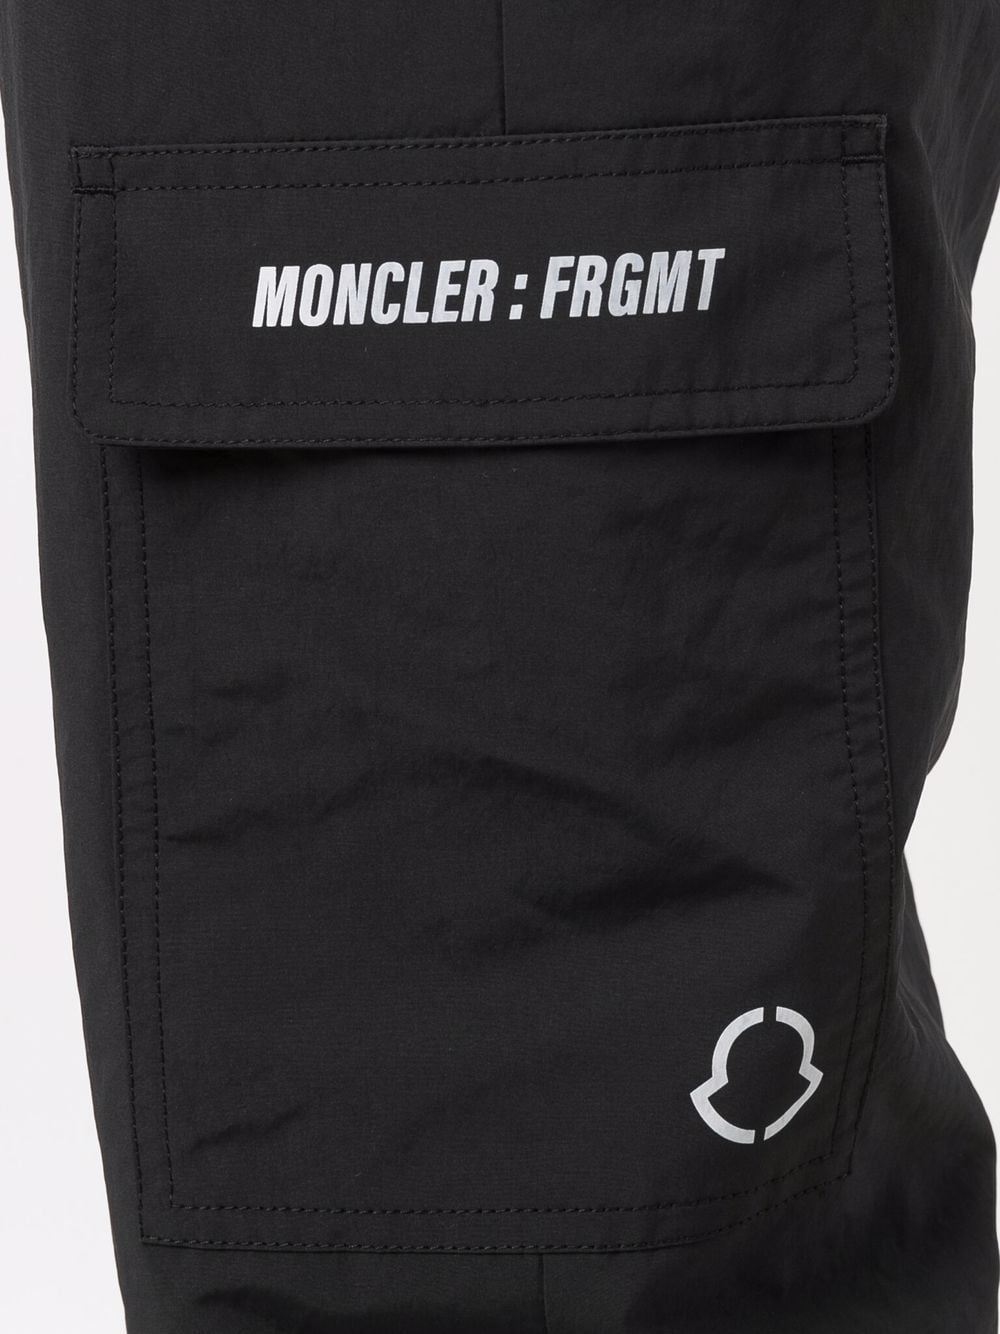 black drawstring cargo trousers Moncler Genius x Fragment Design MONCLER GENIUS |  | 2A000-05-5499N999